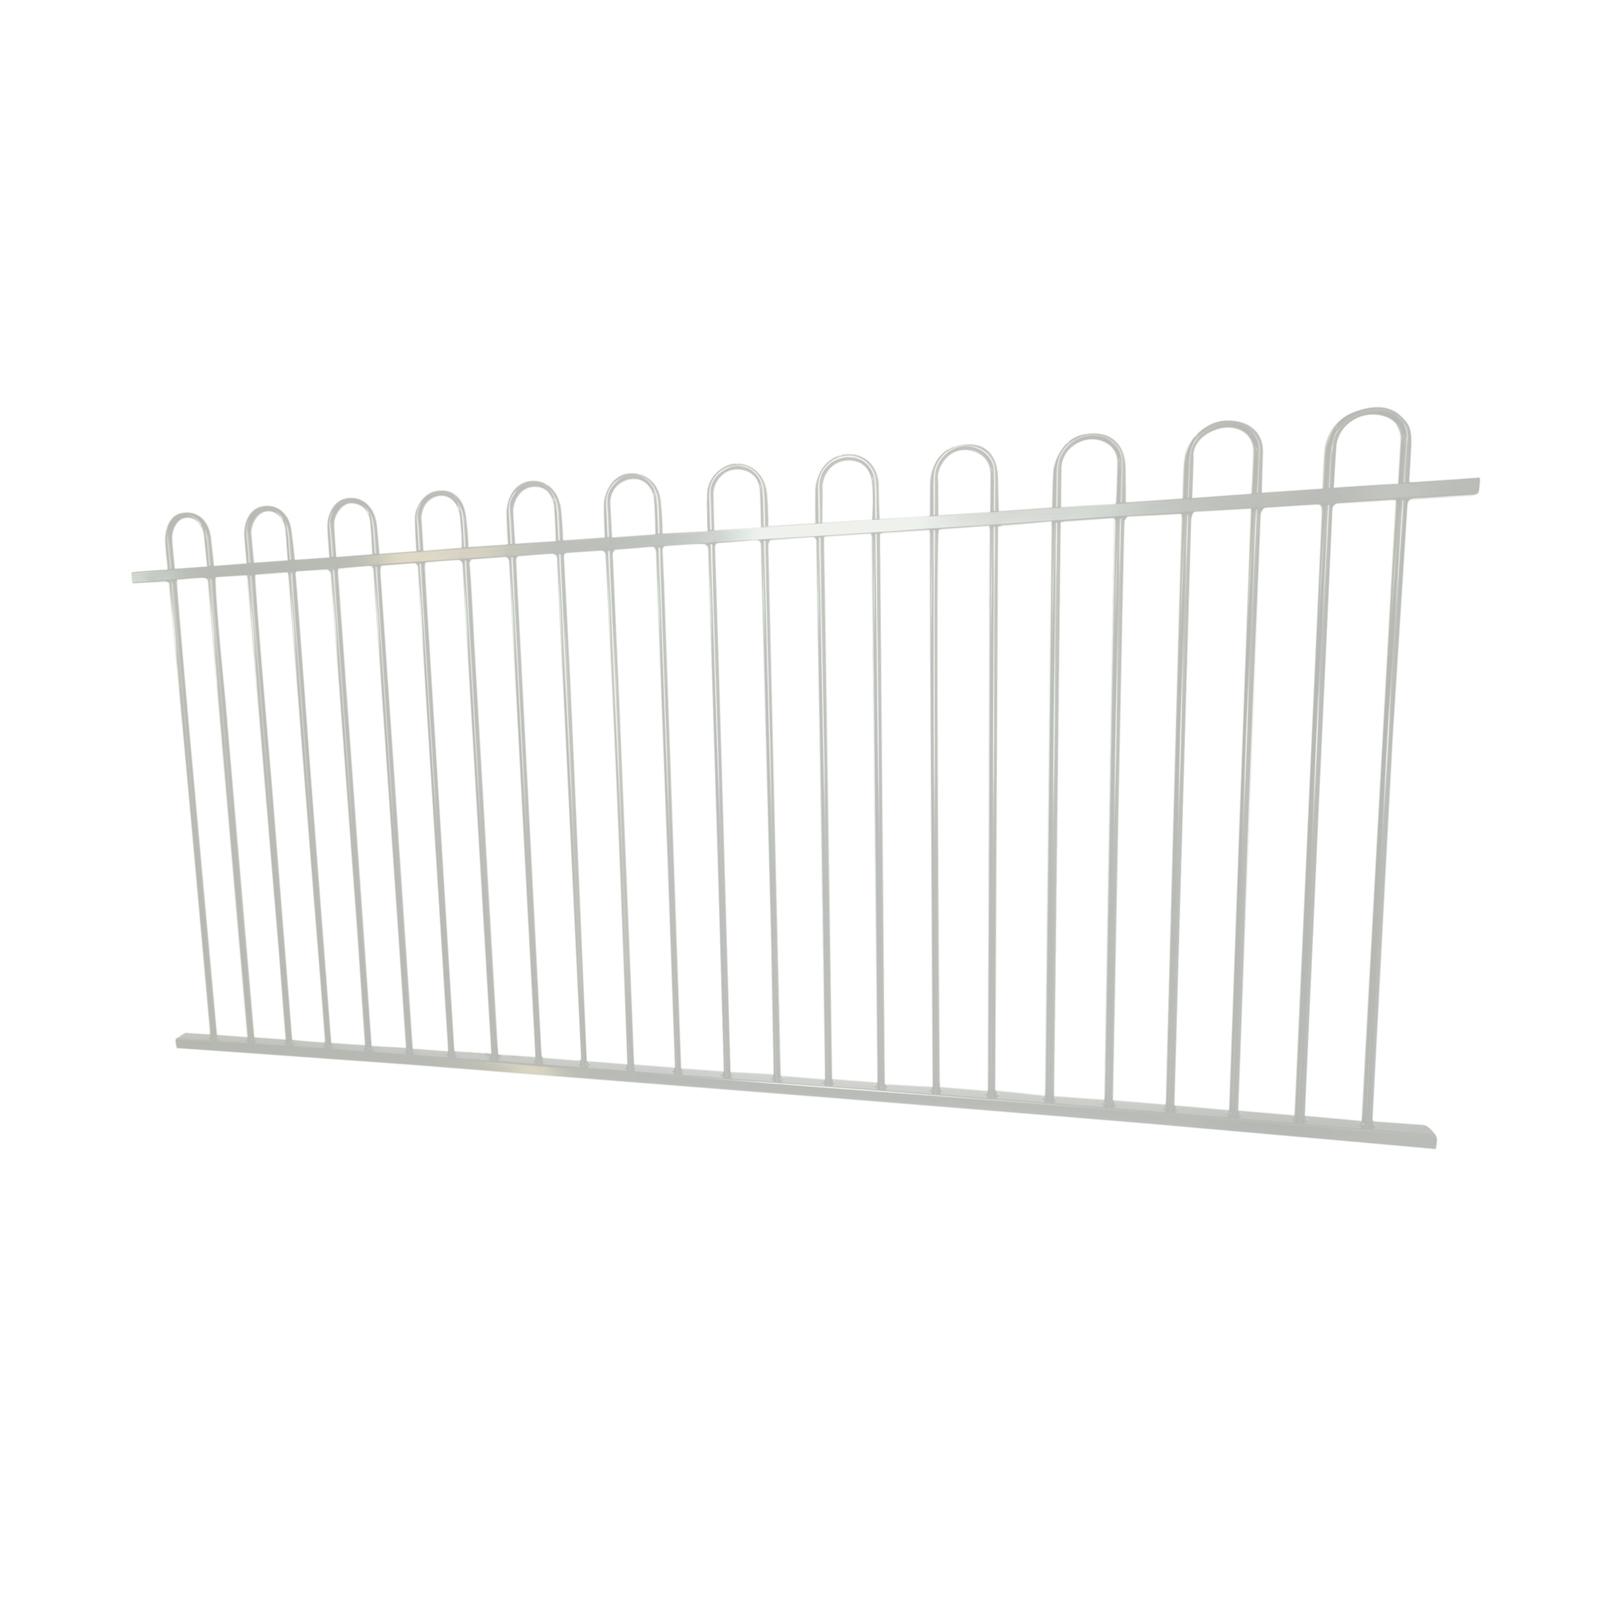 Protector Aluminium 2450 x 1200mm Loop Top Ulti-M8 Fence Panel - Pearl White